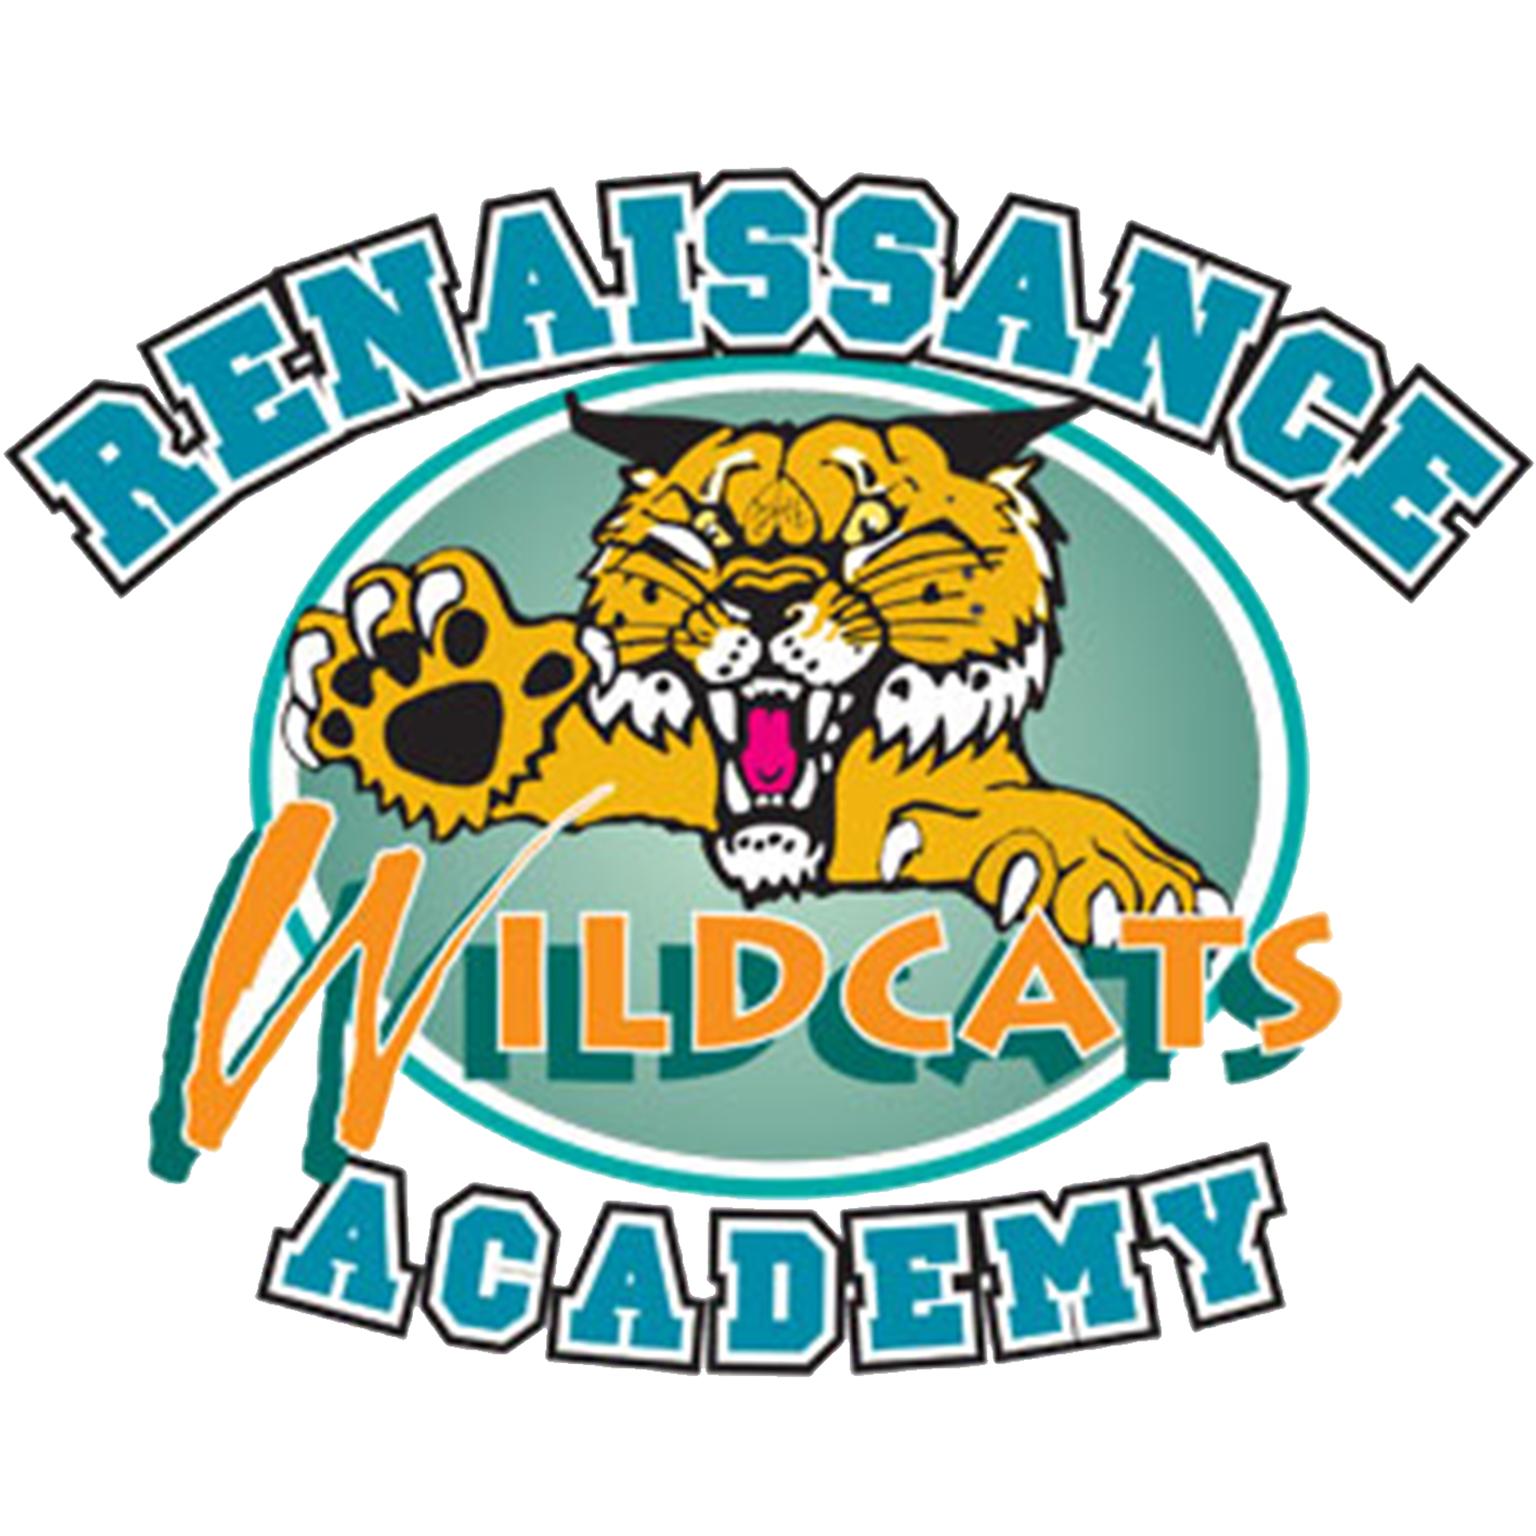 Renaissance Academy